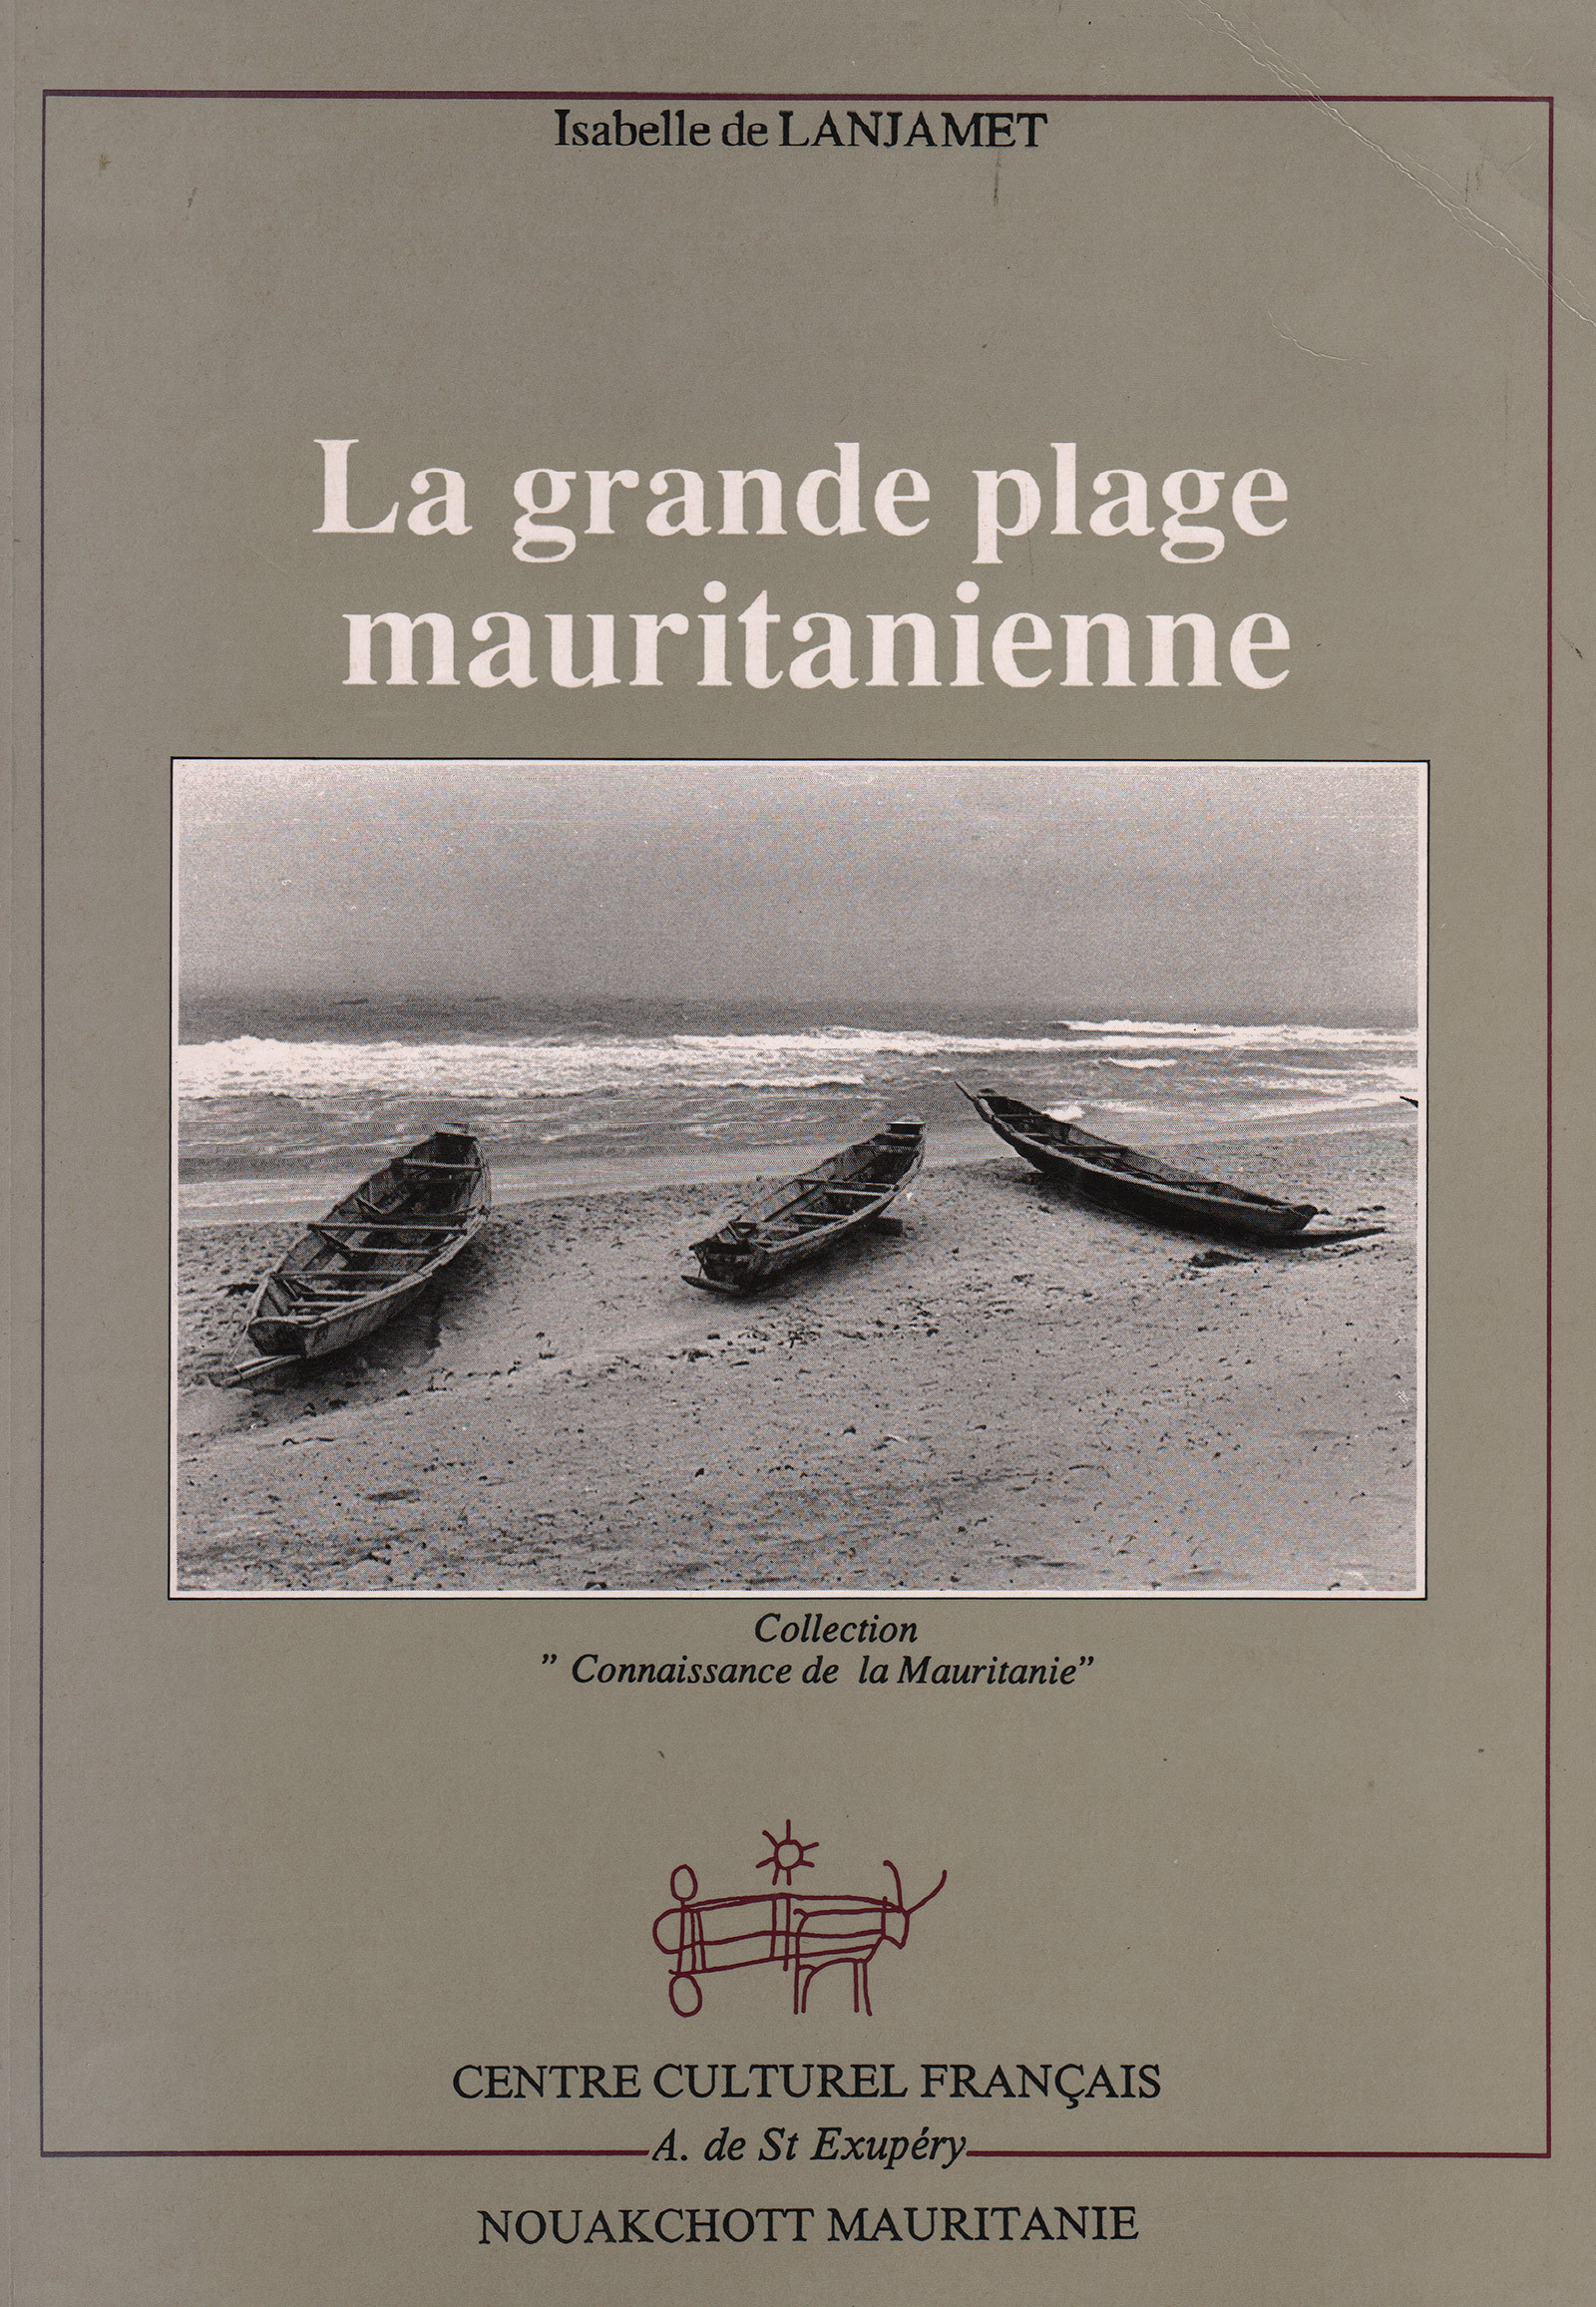 LA GRANDE PLAGE MAURITANIENNE